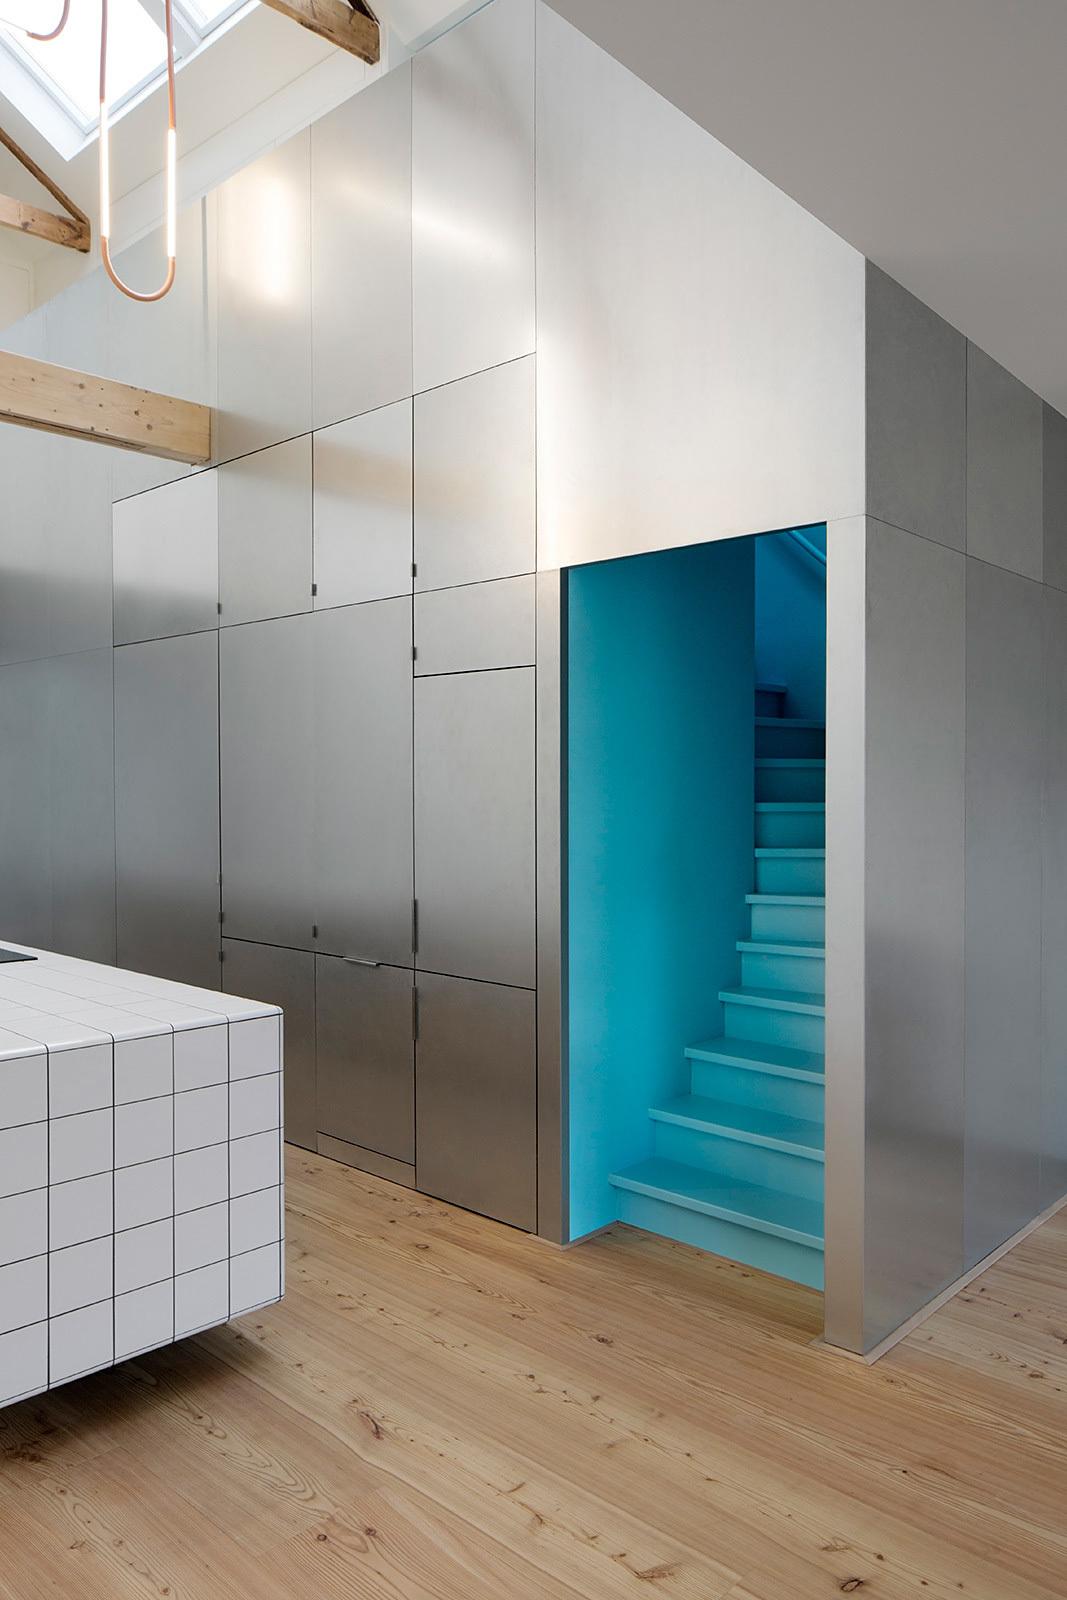 Matryoshka House in Rotterdam, Netherlands by shift architecture urbanism; Photo: NoortjeKnulst